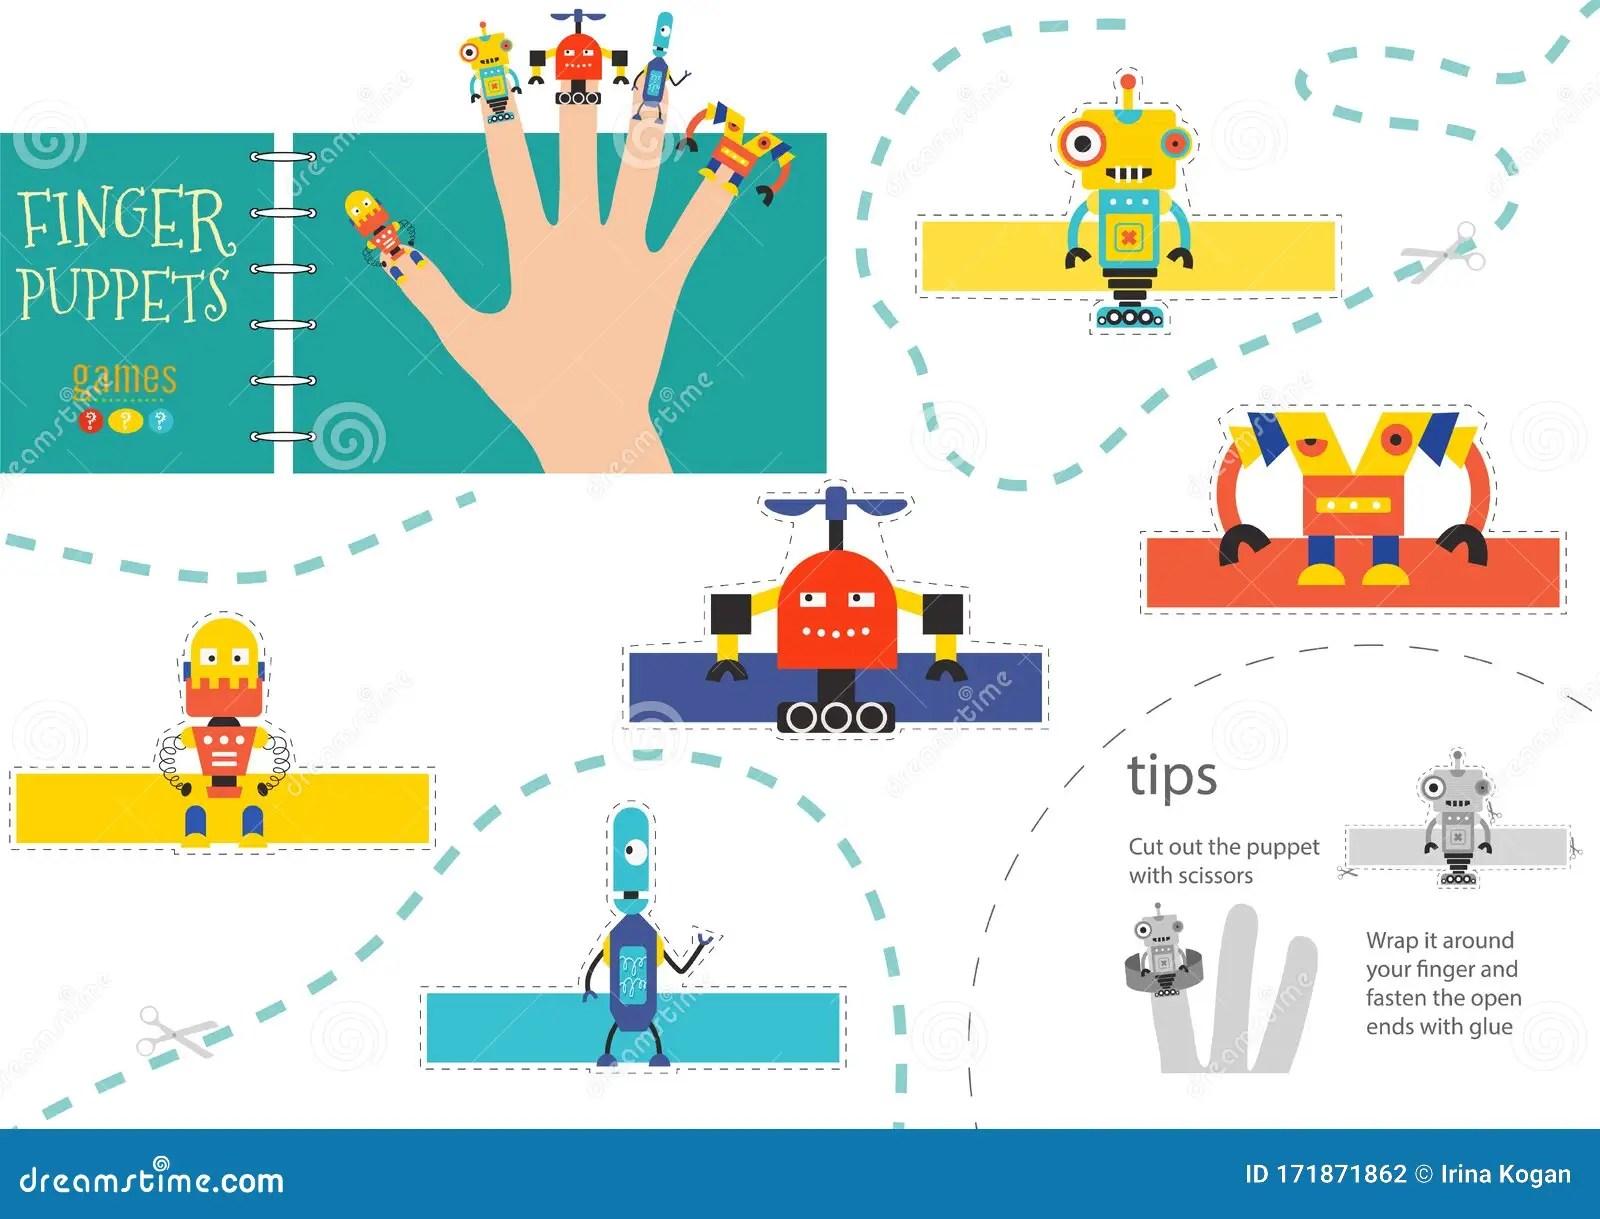 5 Finger Puppet Vector Robots Cut And Glue Educational